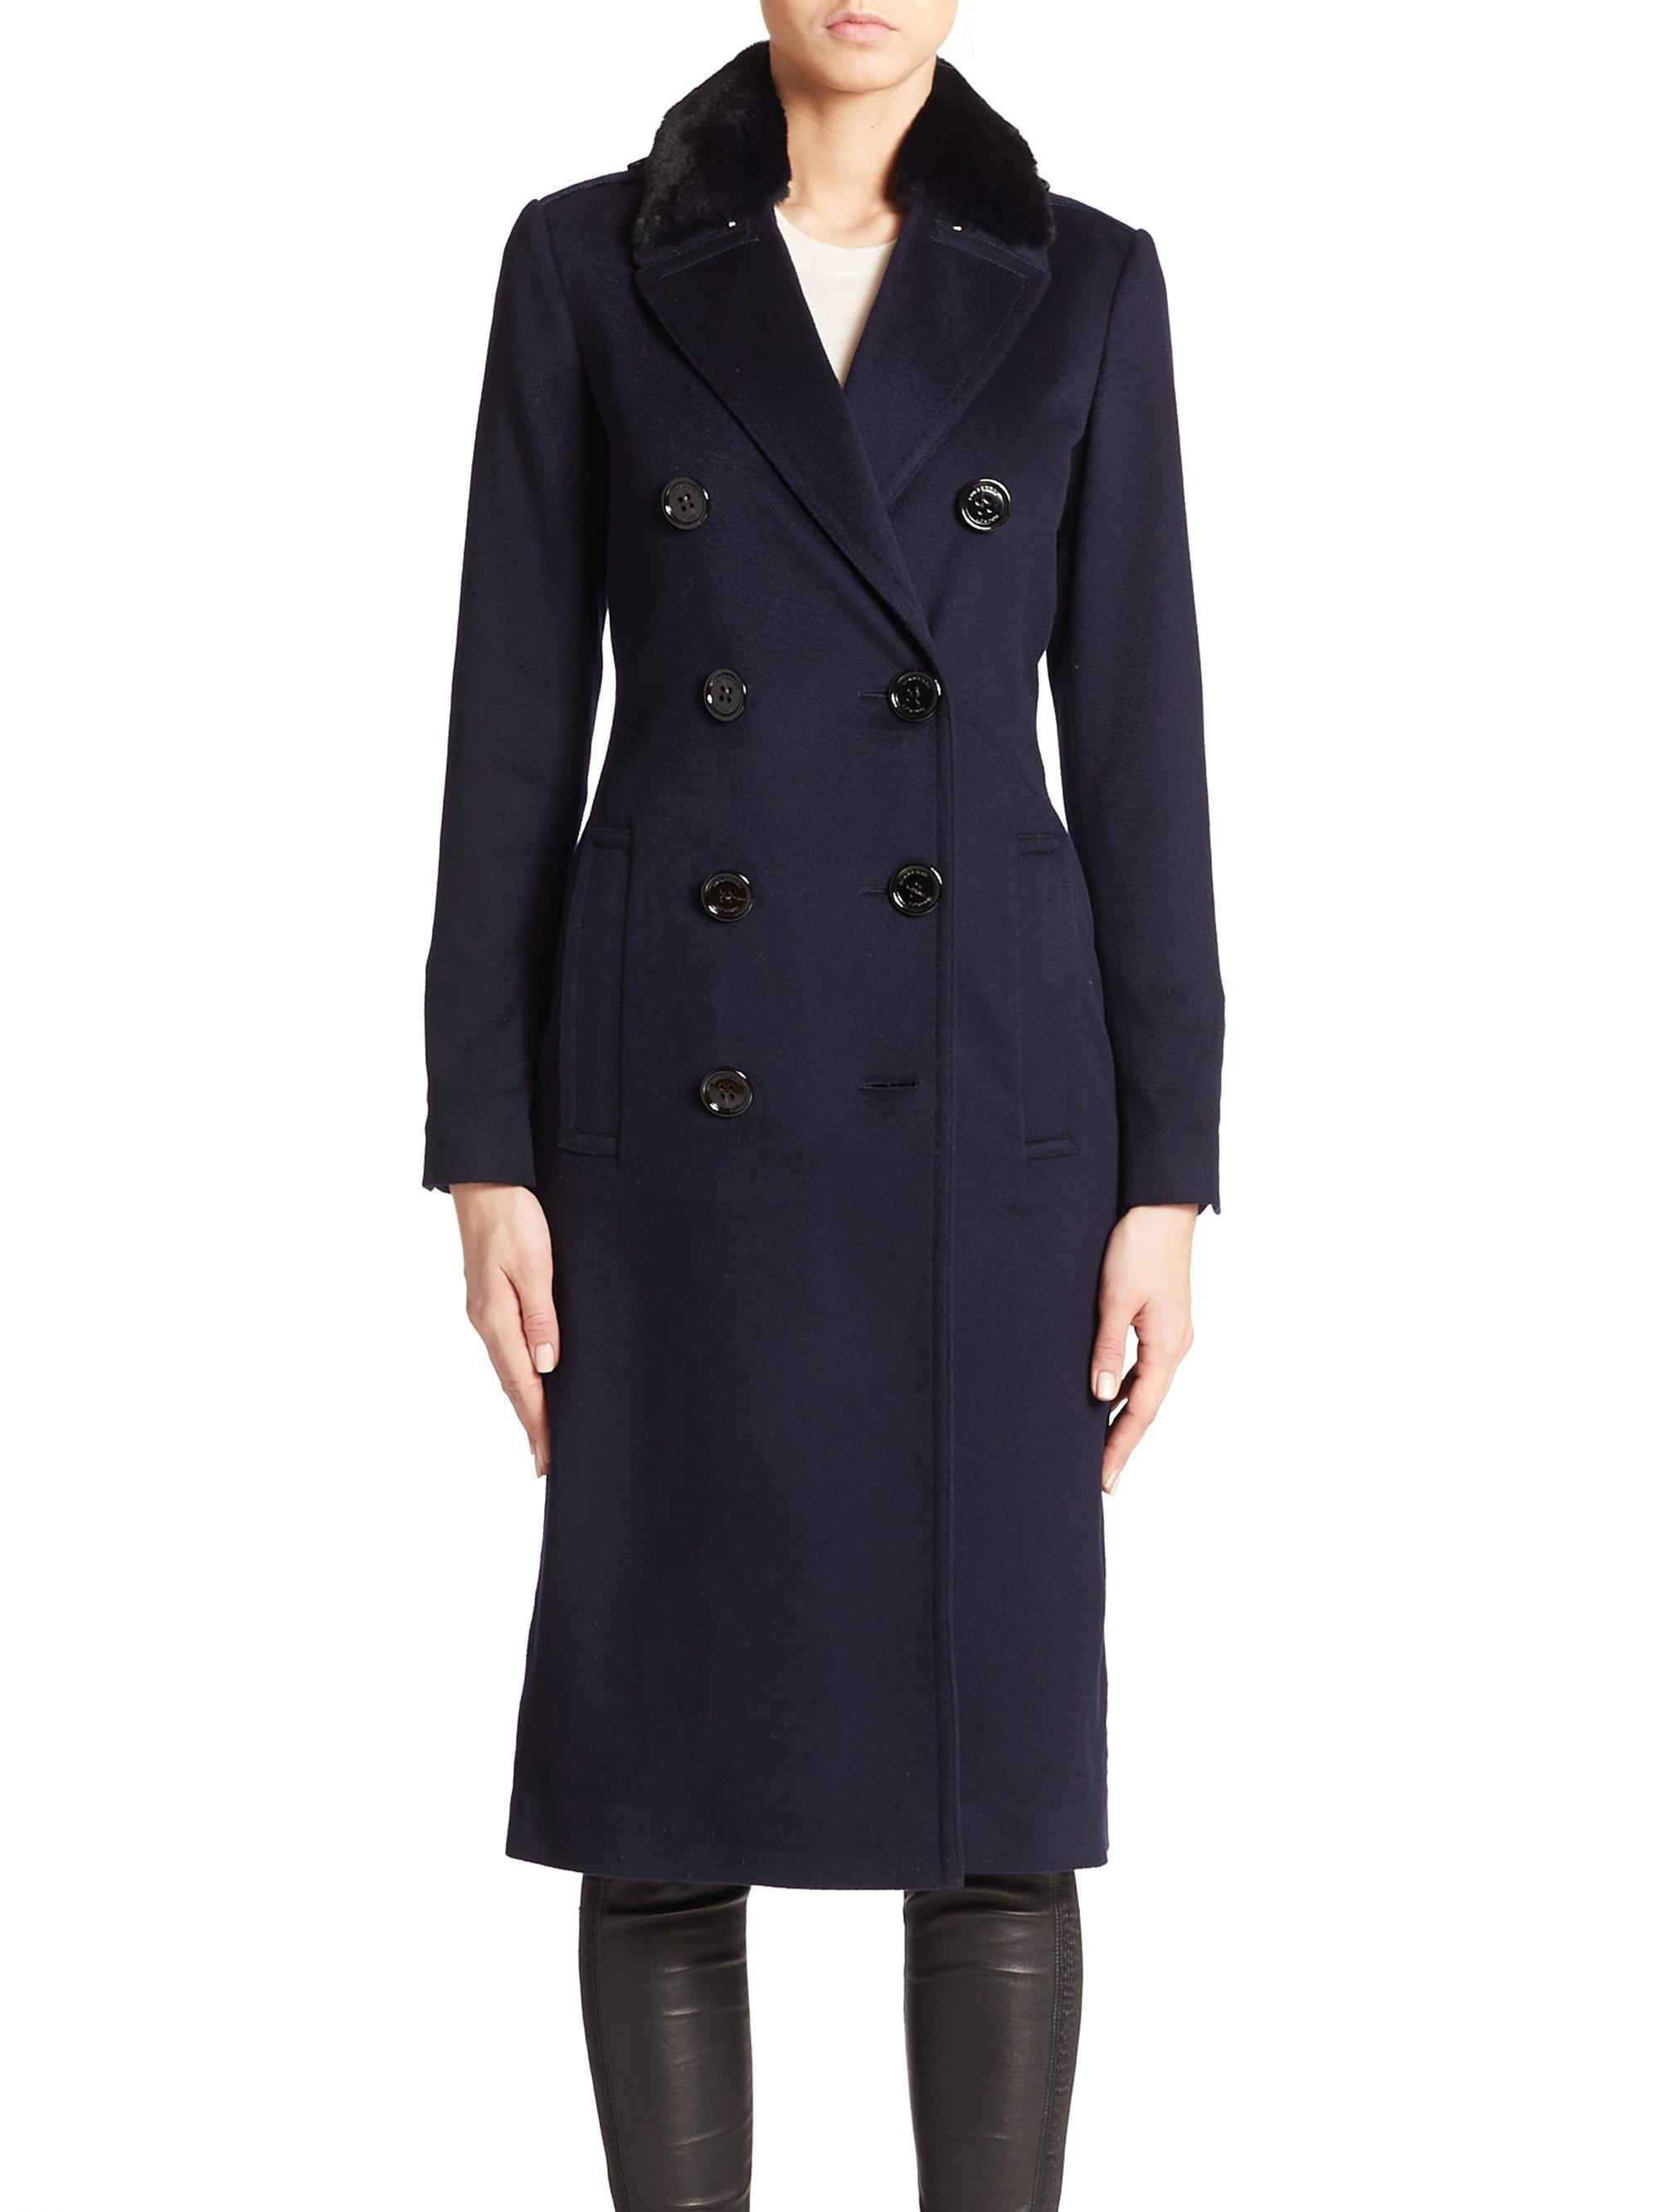 Burberry Newford Fur-collar Cashmere Coat in Blue | Lyst